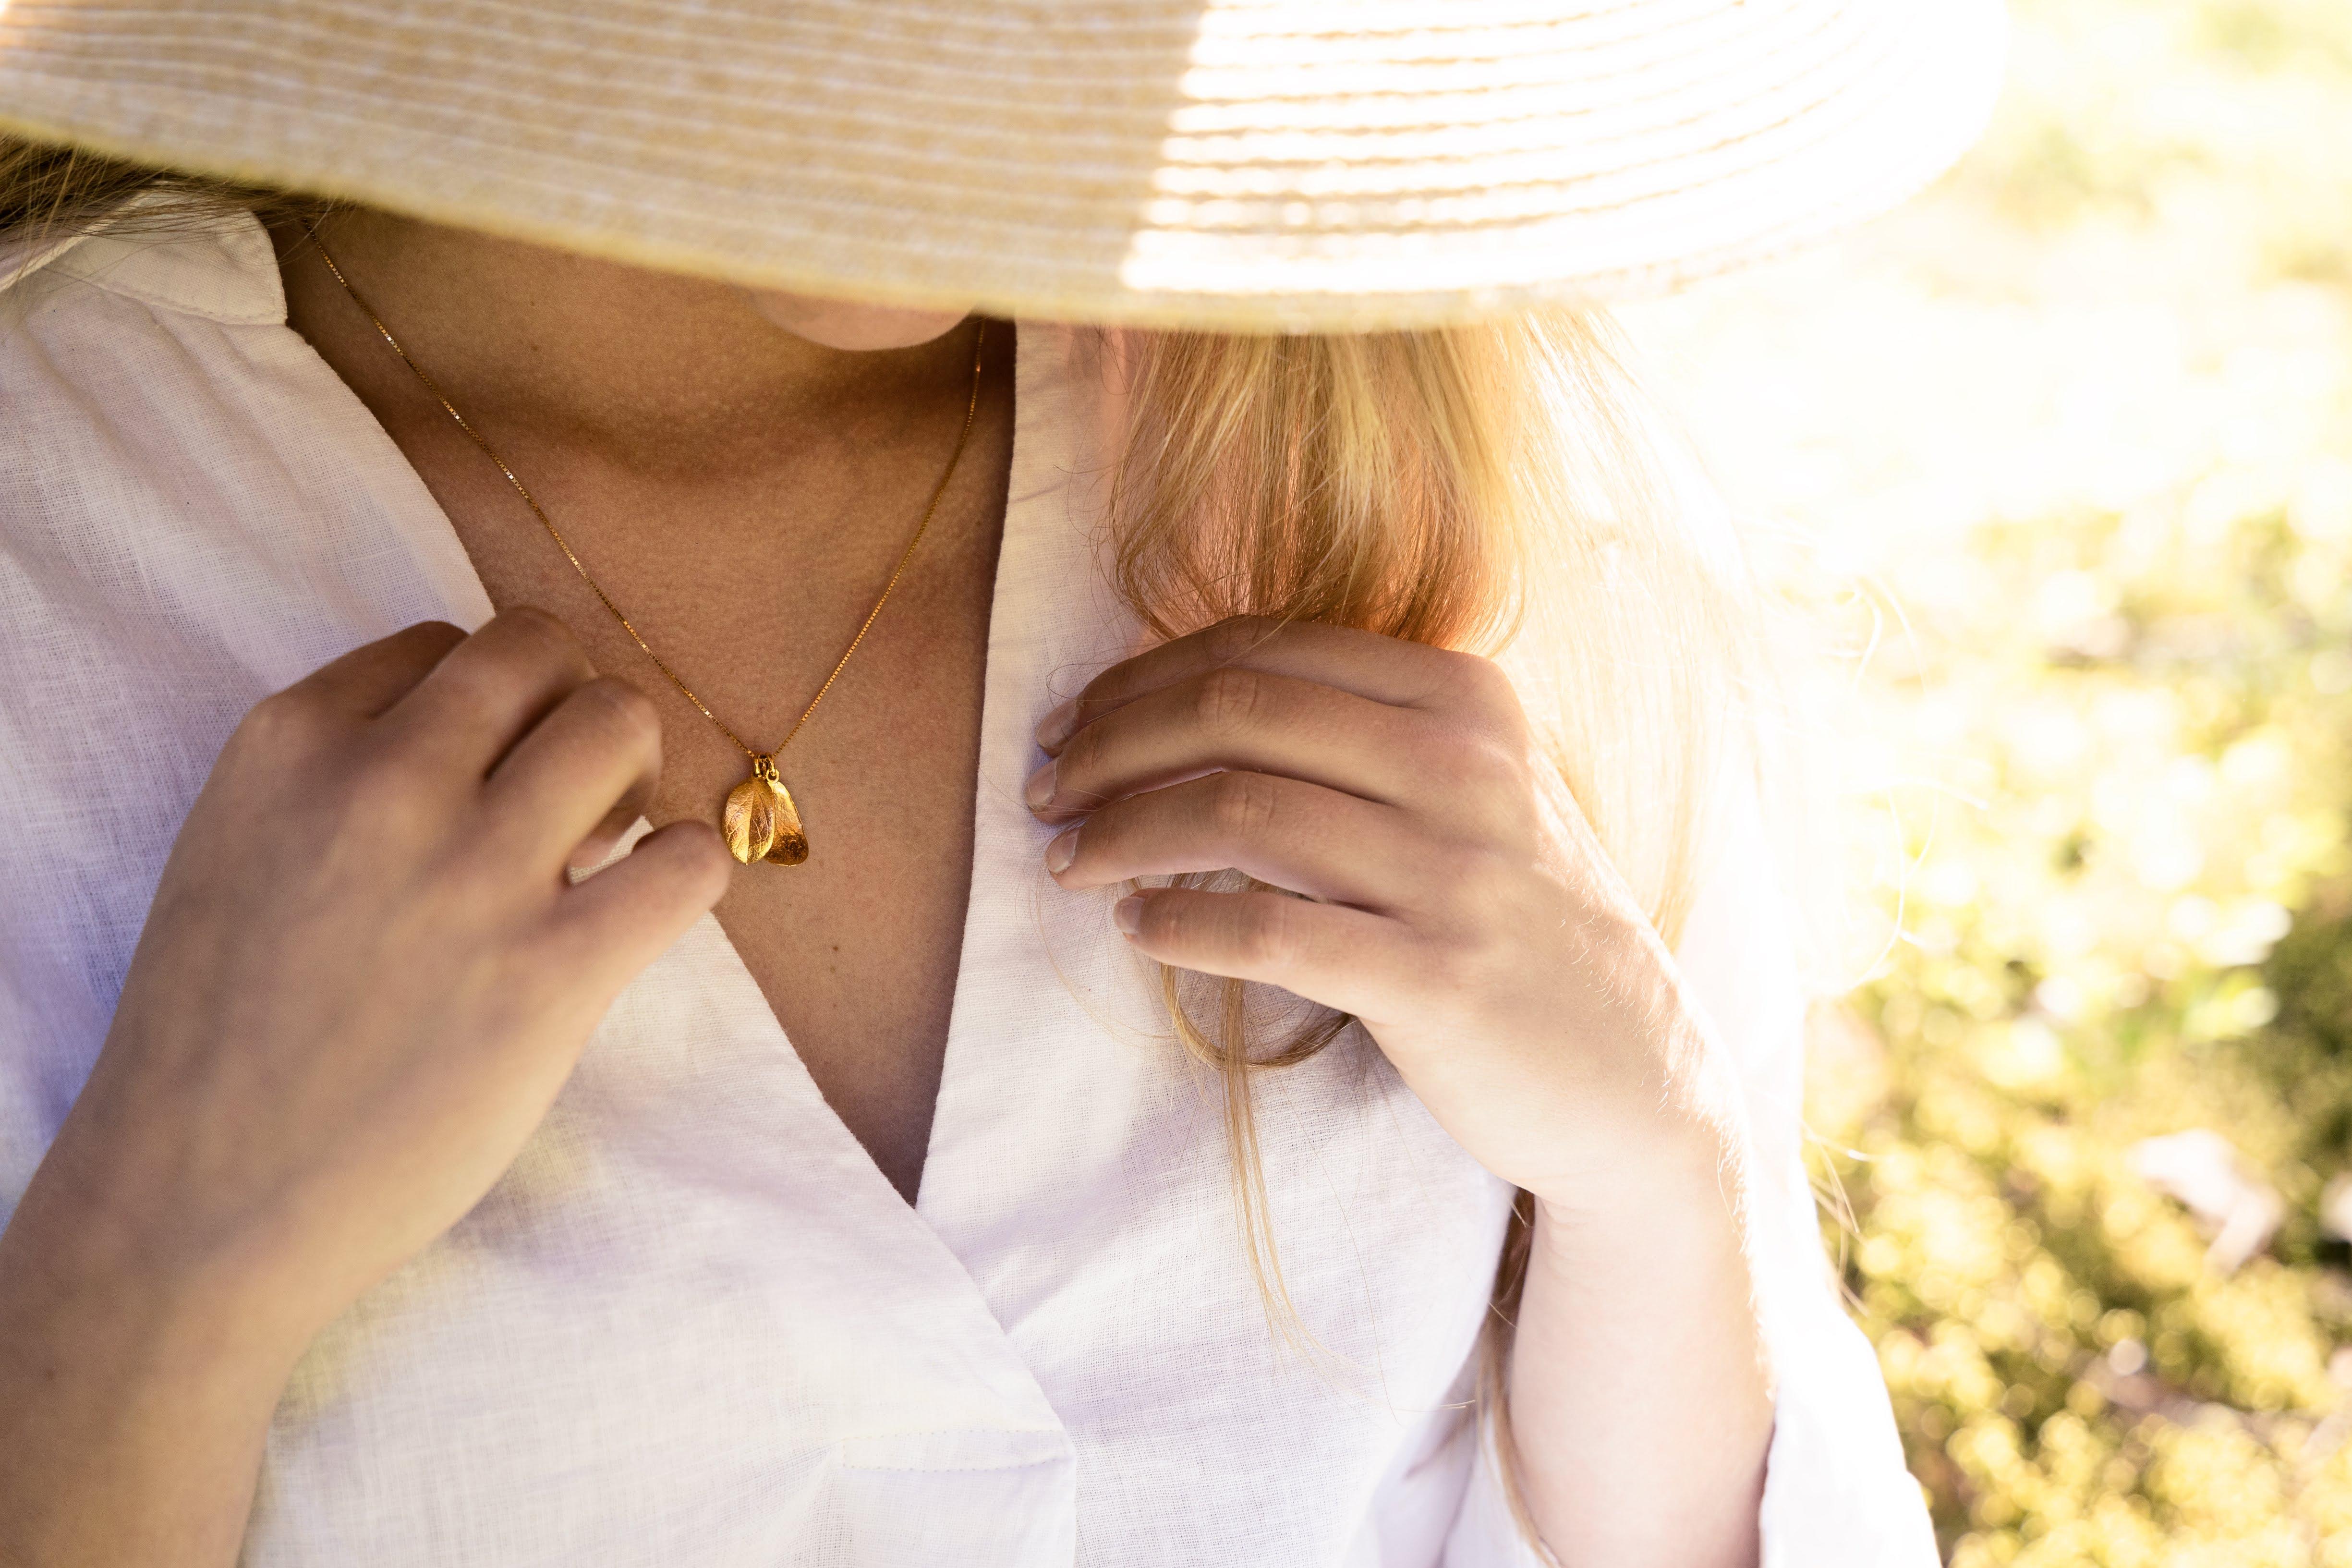 Eternal Lingon necklace, golden